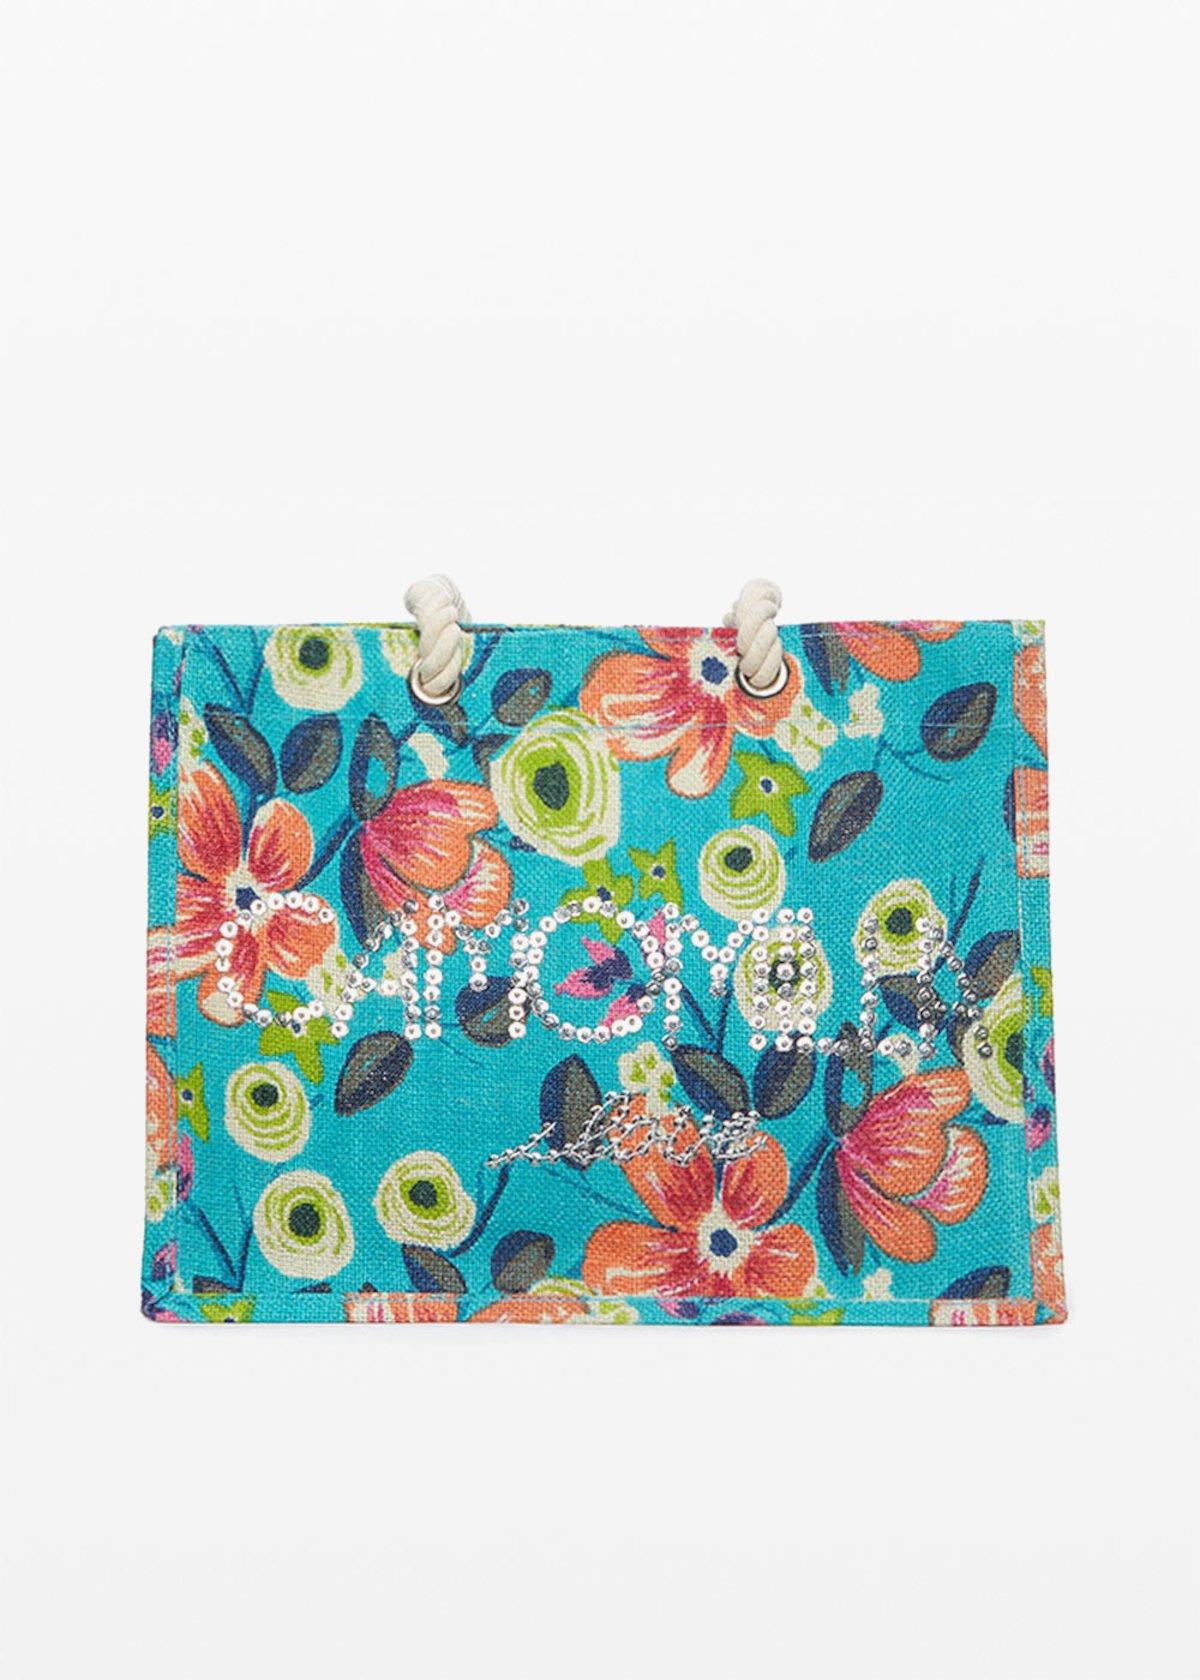 Biky flowers print jute bag with Camomilla ilove logo on the front - Sky / Avocado  Fantasia - Woman - Category image